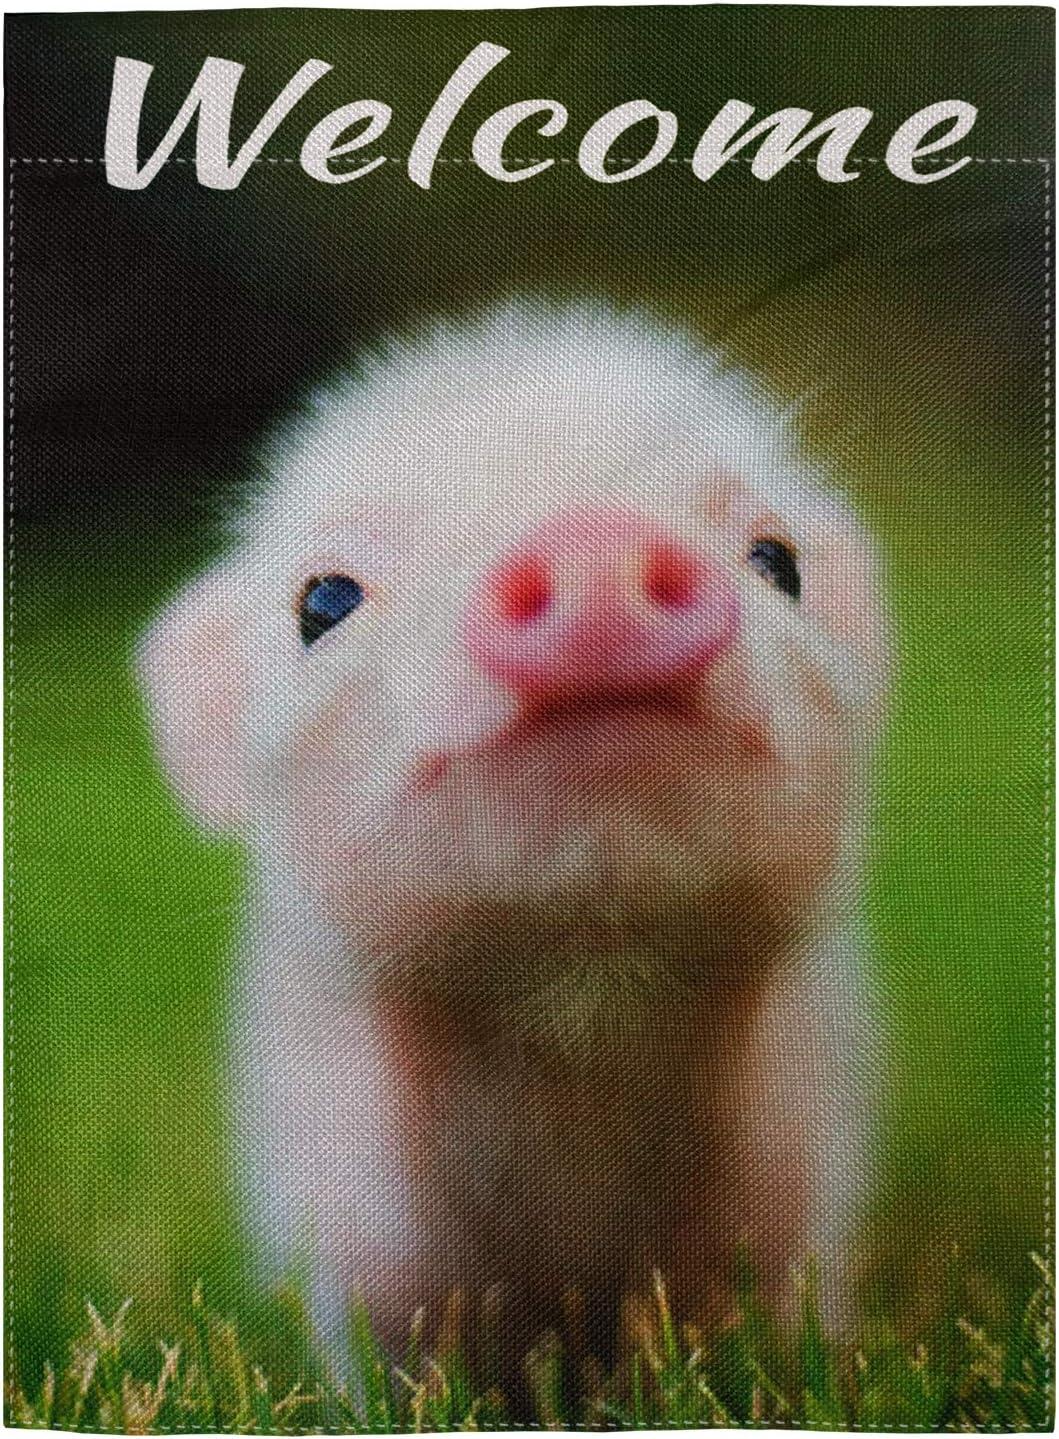 Girl Who Loves Pigs Black Pig  Double Sided Soft Flag  **GARDEN SIZE**   FG1287